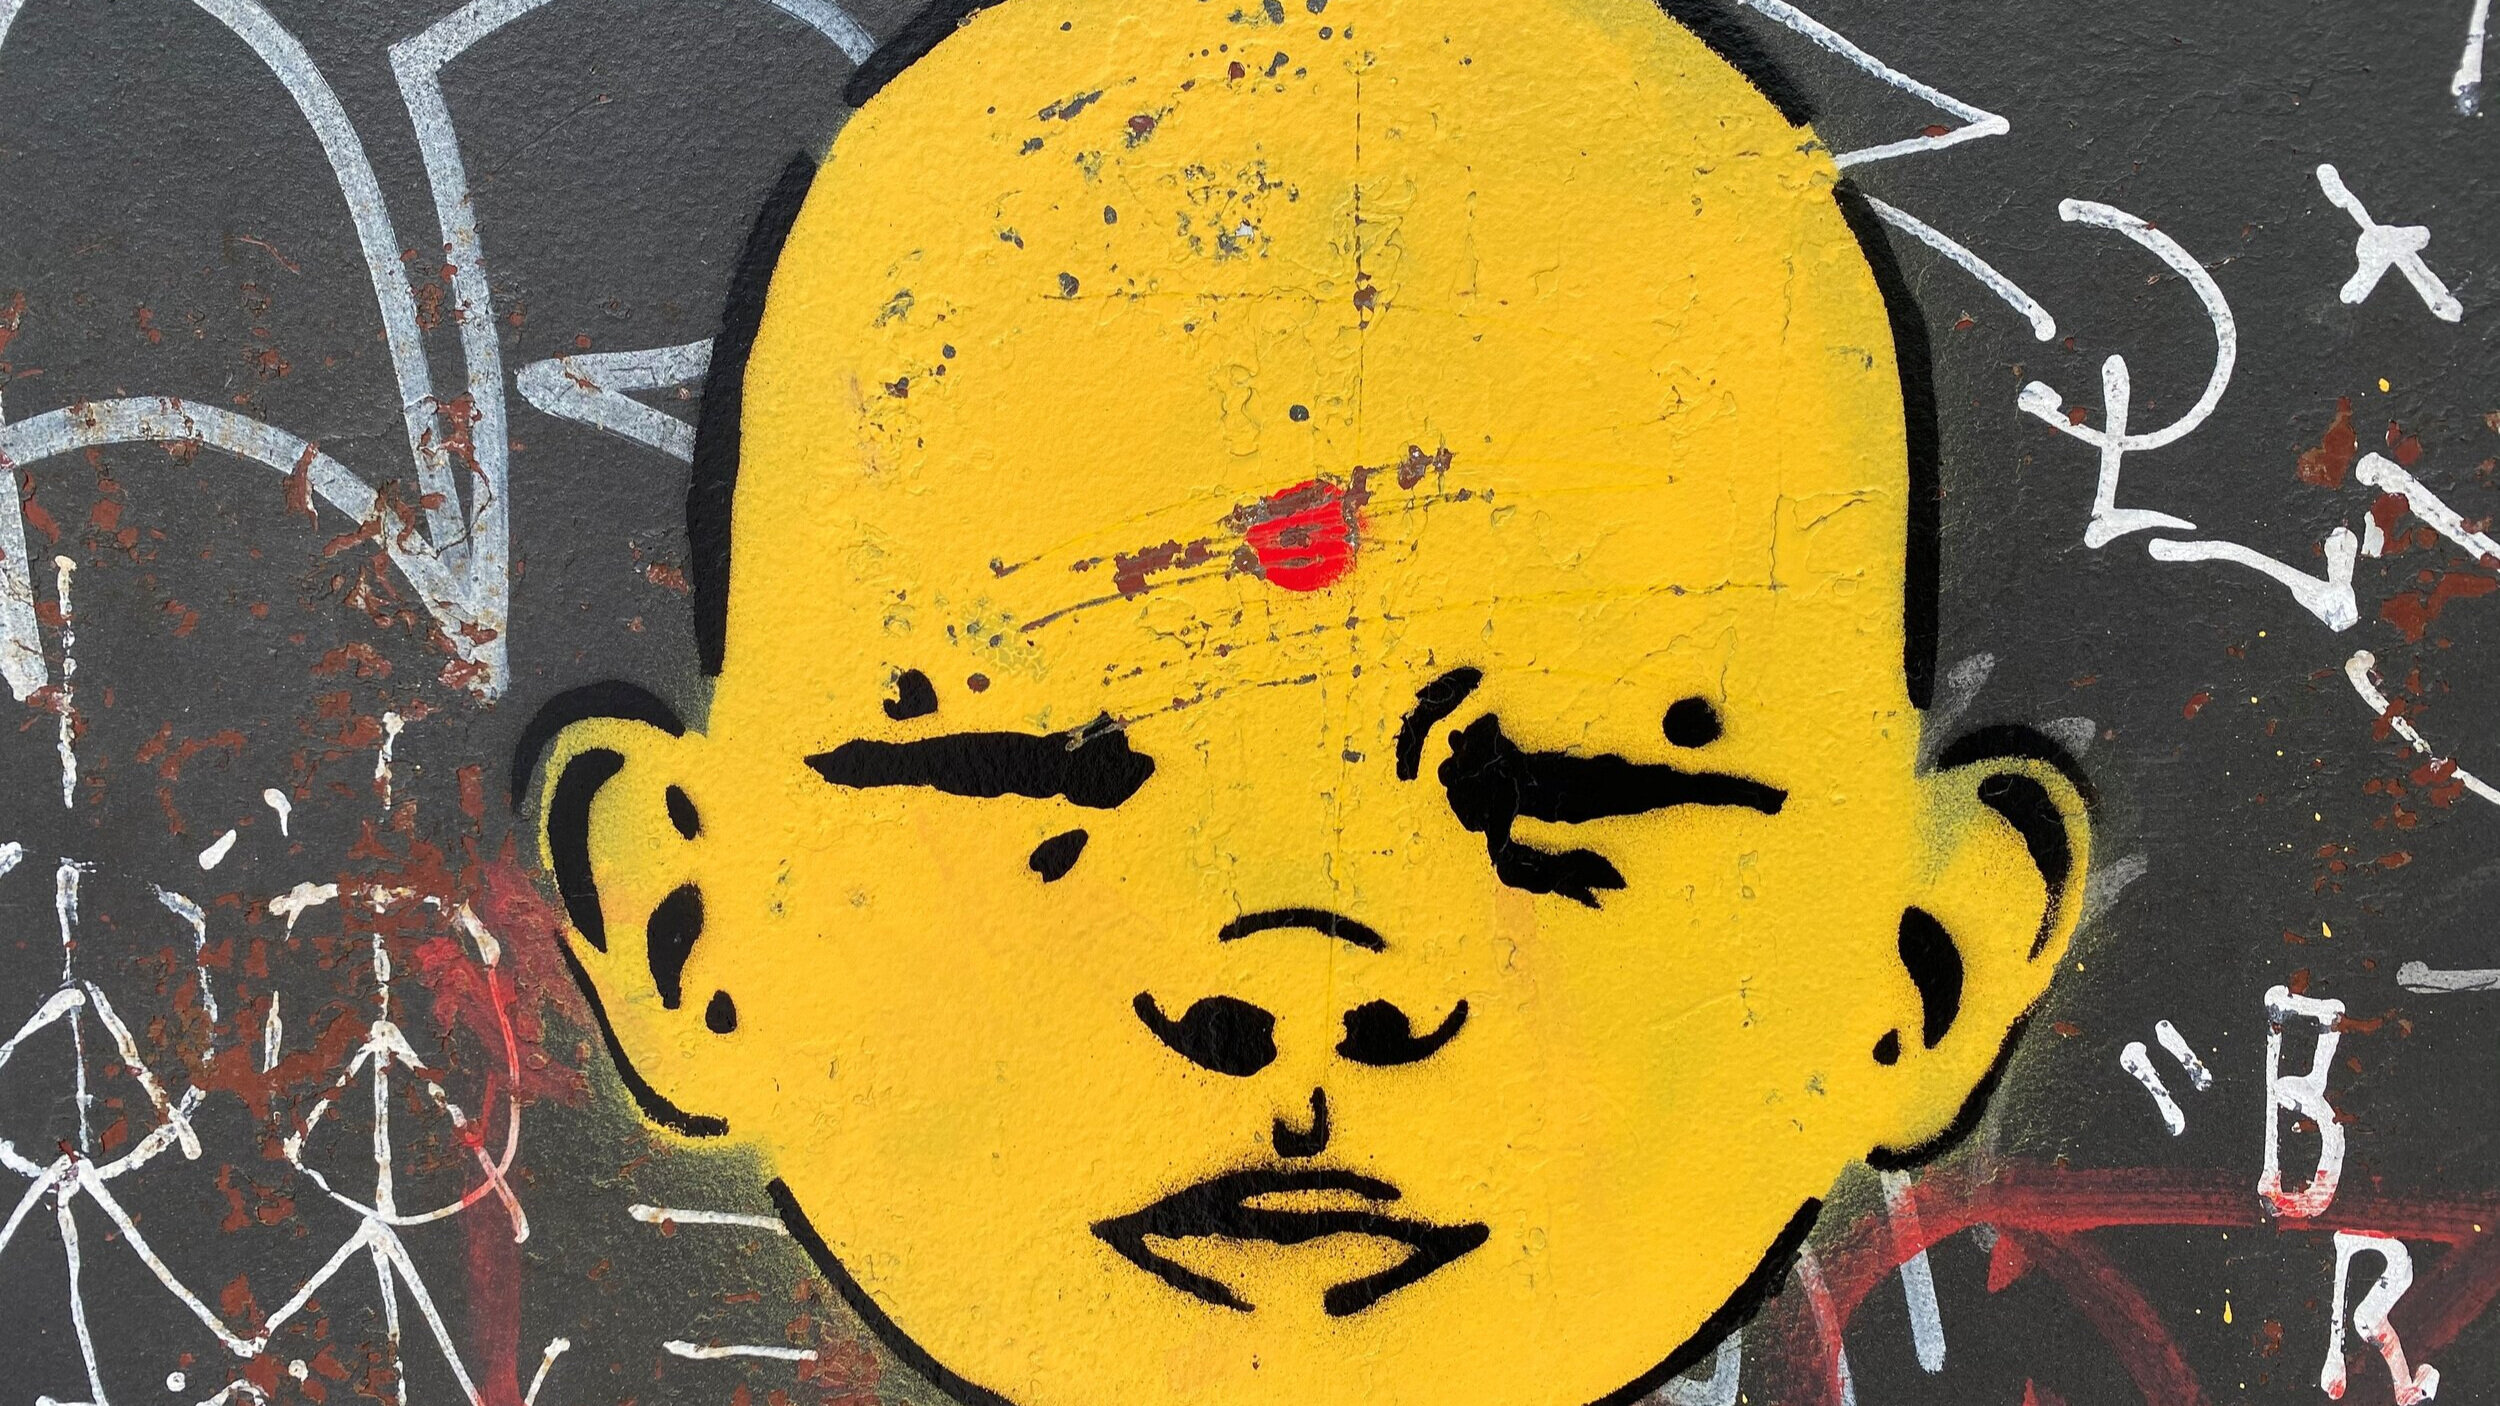 20200520+Achtsam+Graffiti.jpg